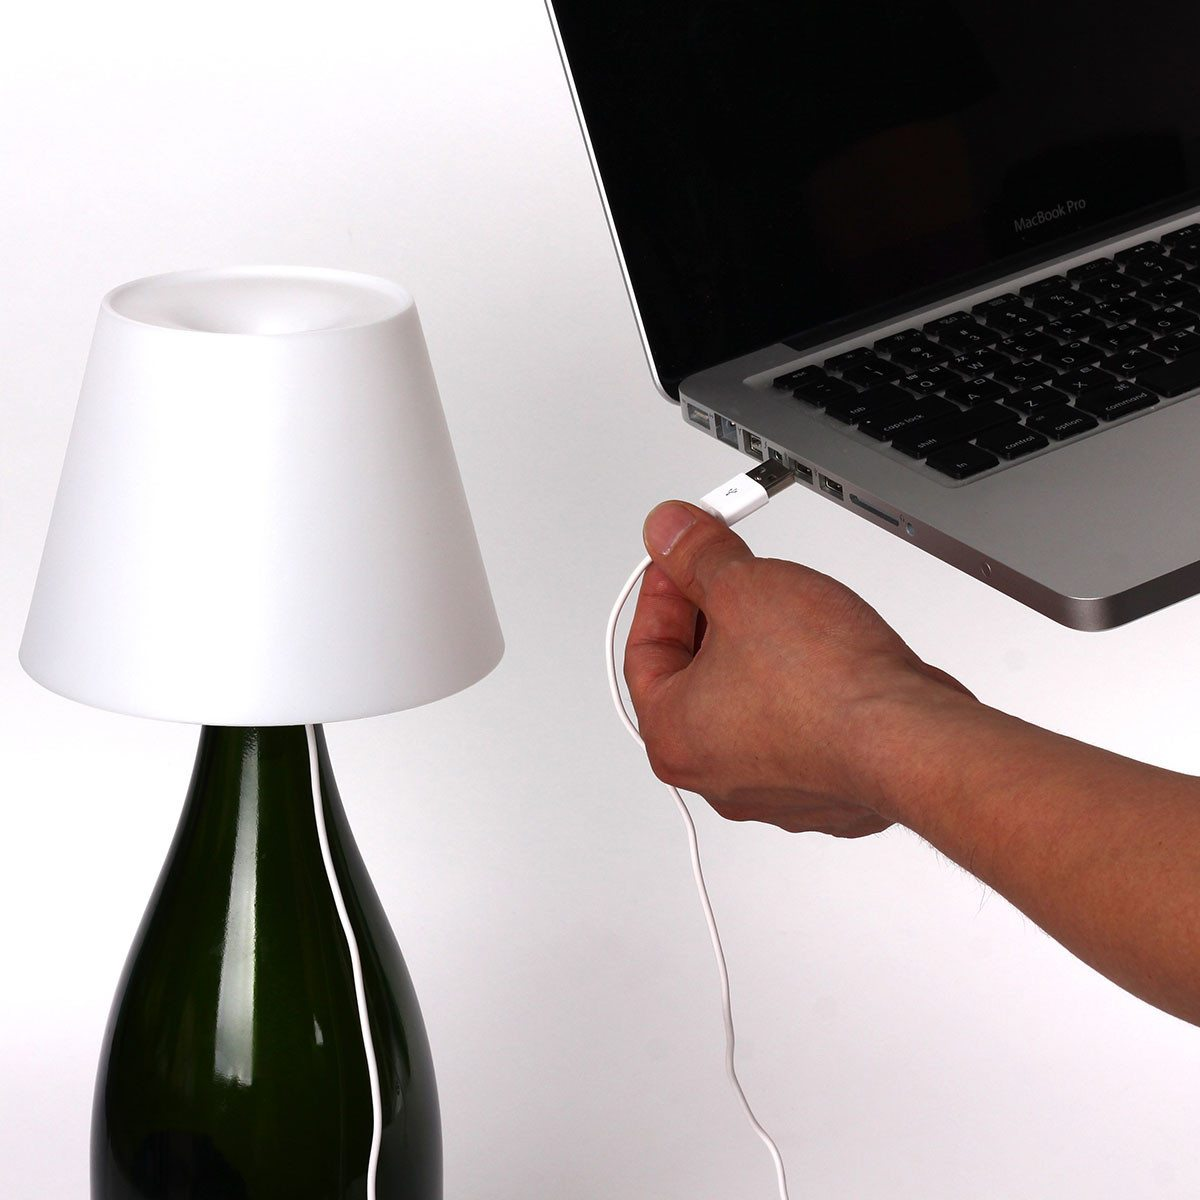 Winey - Der Lampenschirm